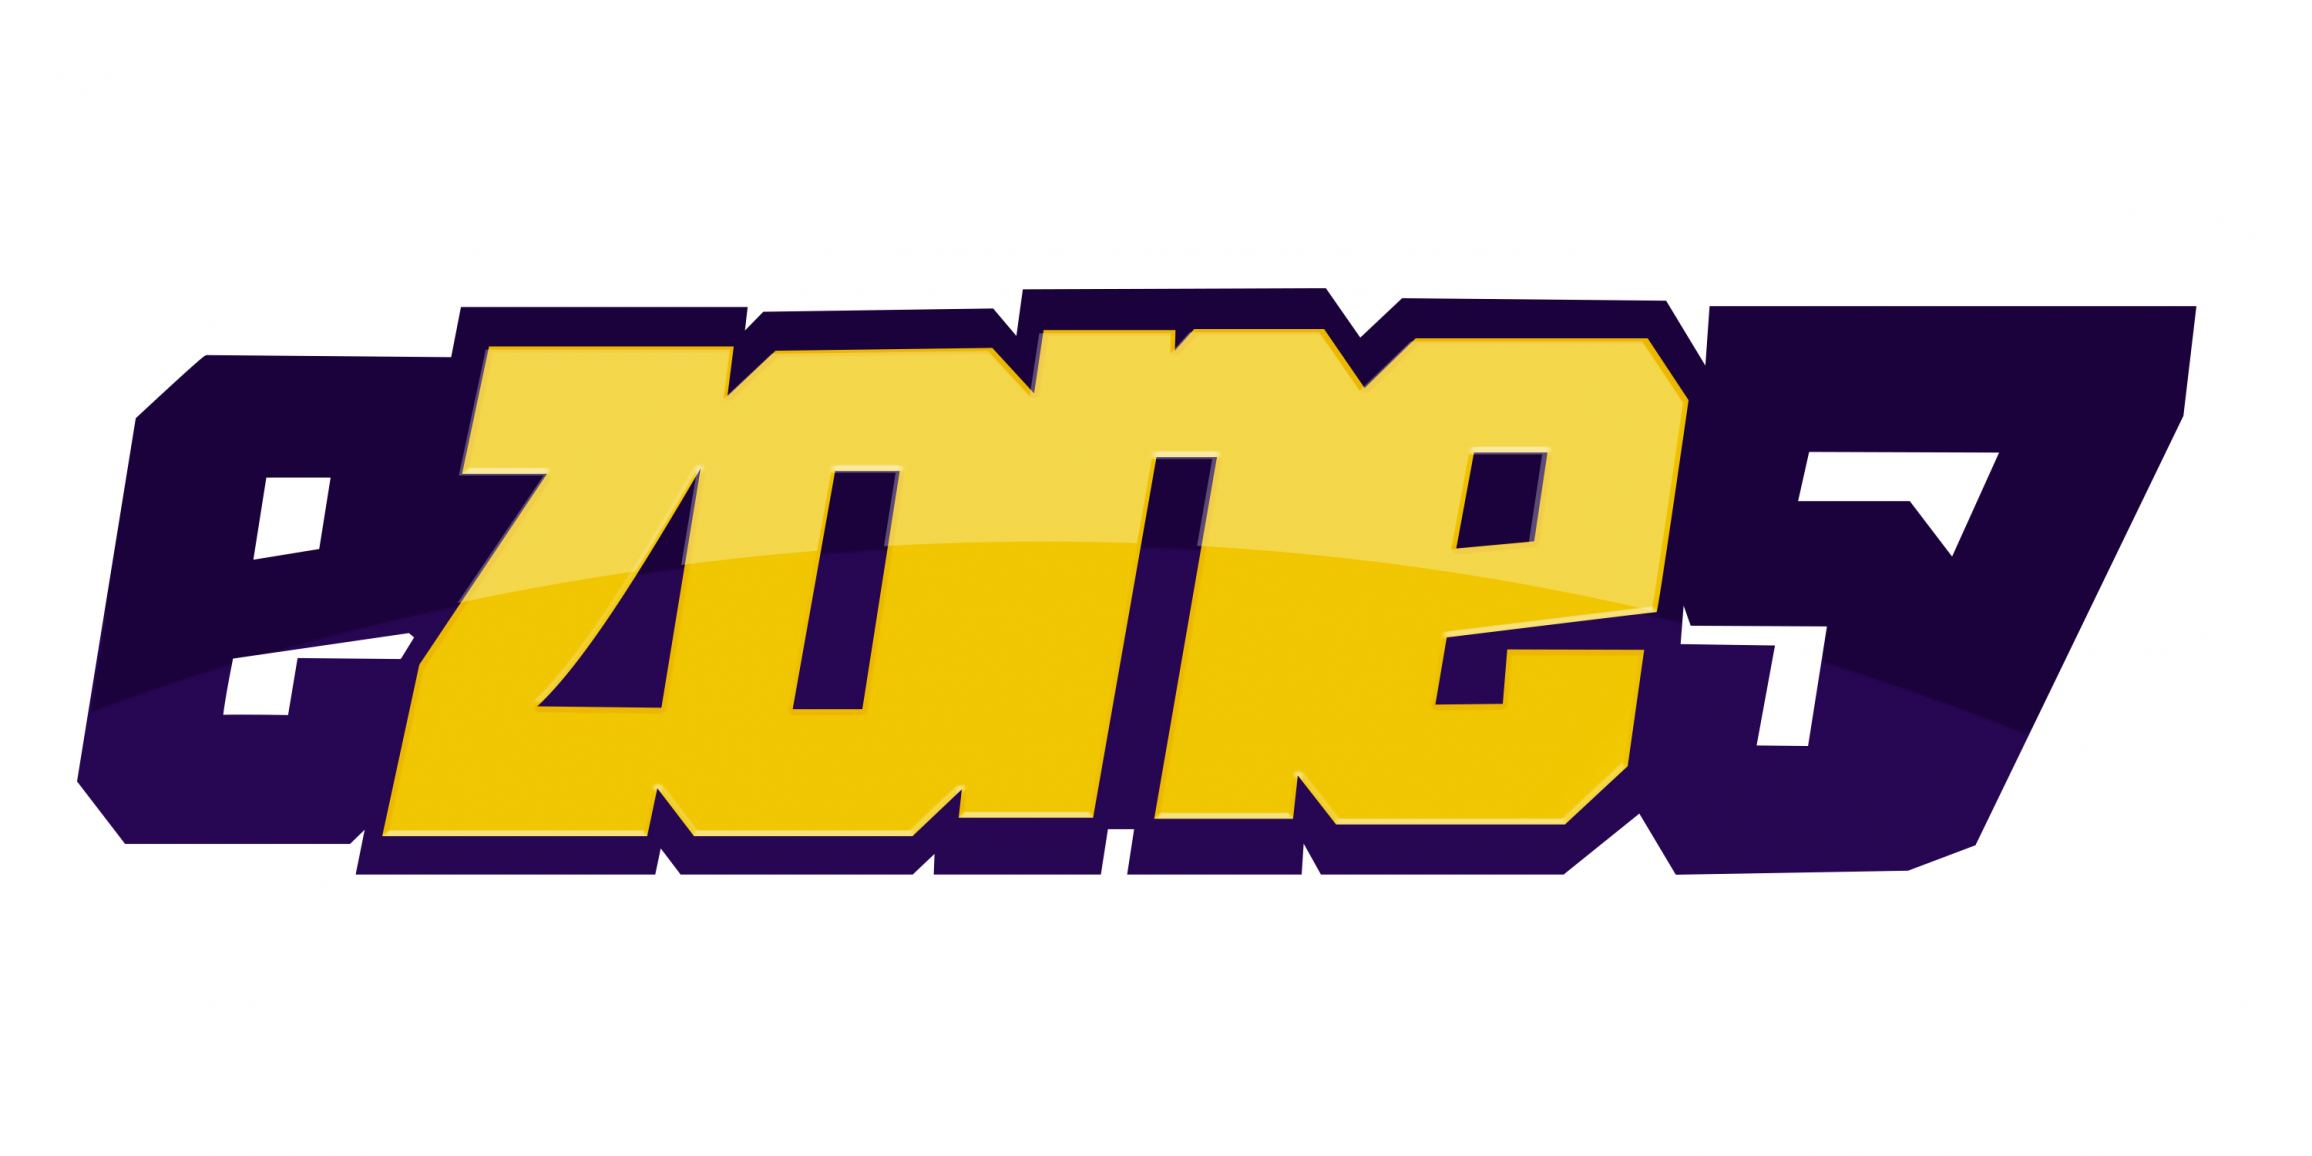 Ezone57 Media Logo